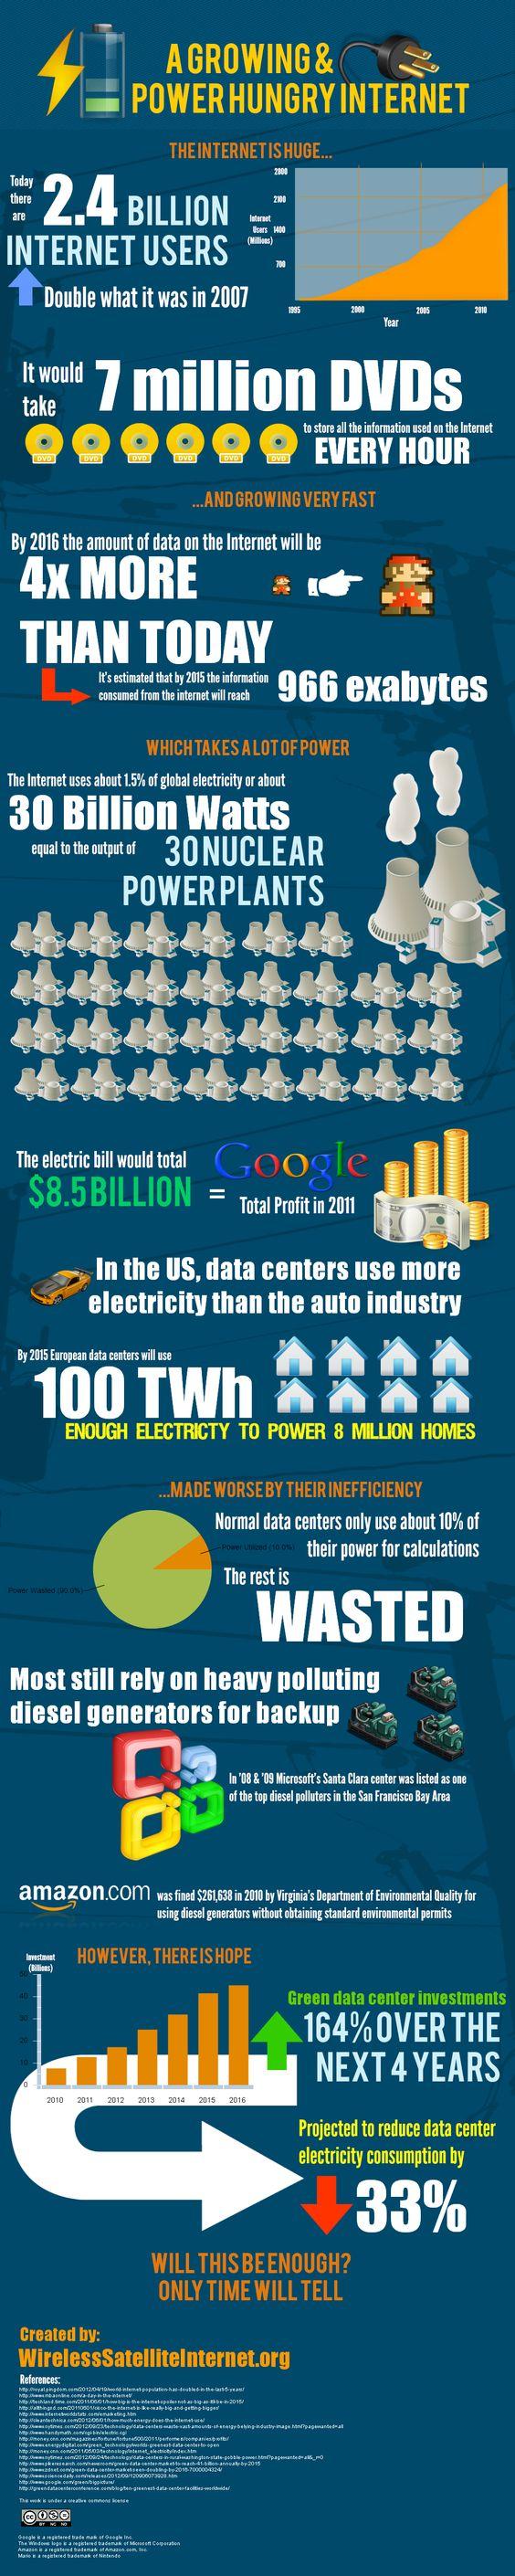 El alucinante tamaño de Internet #infografia #infographic